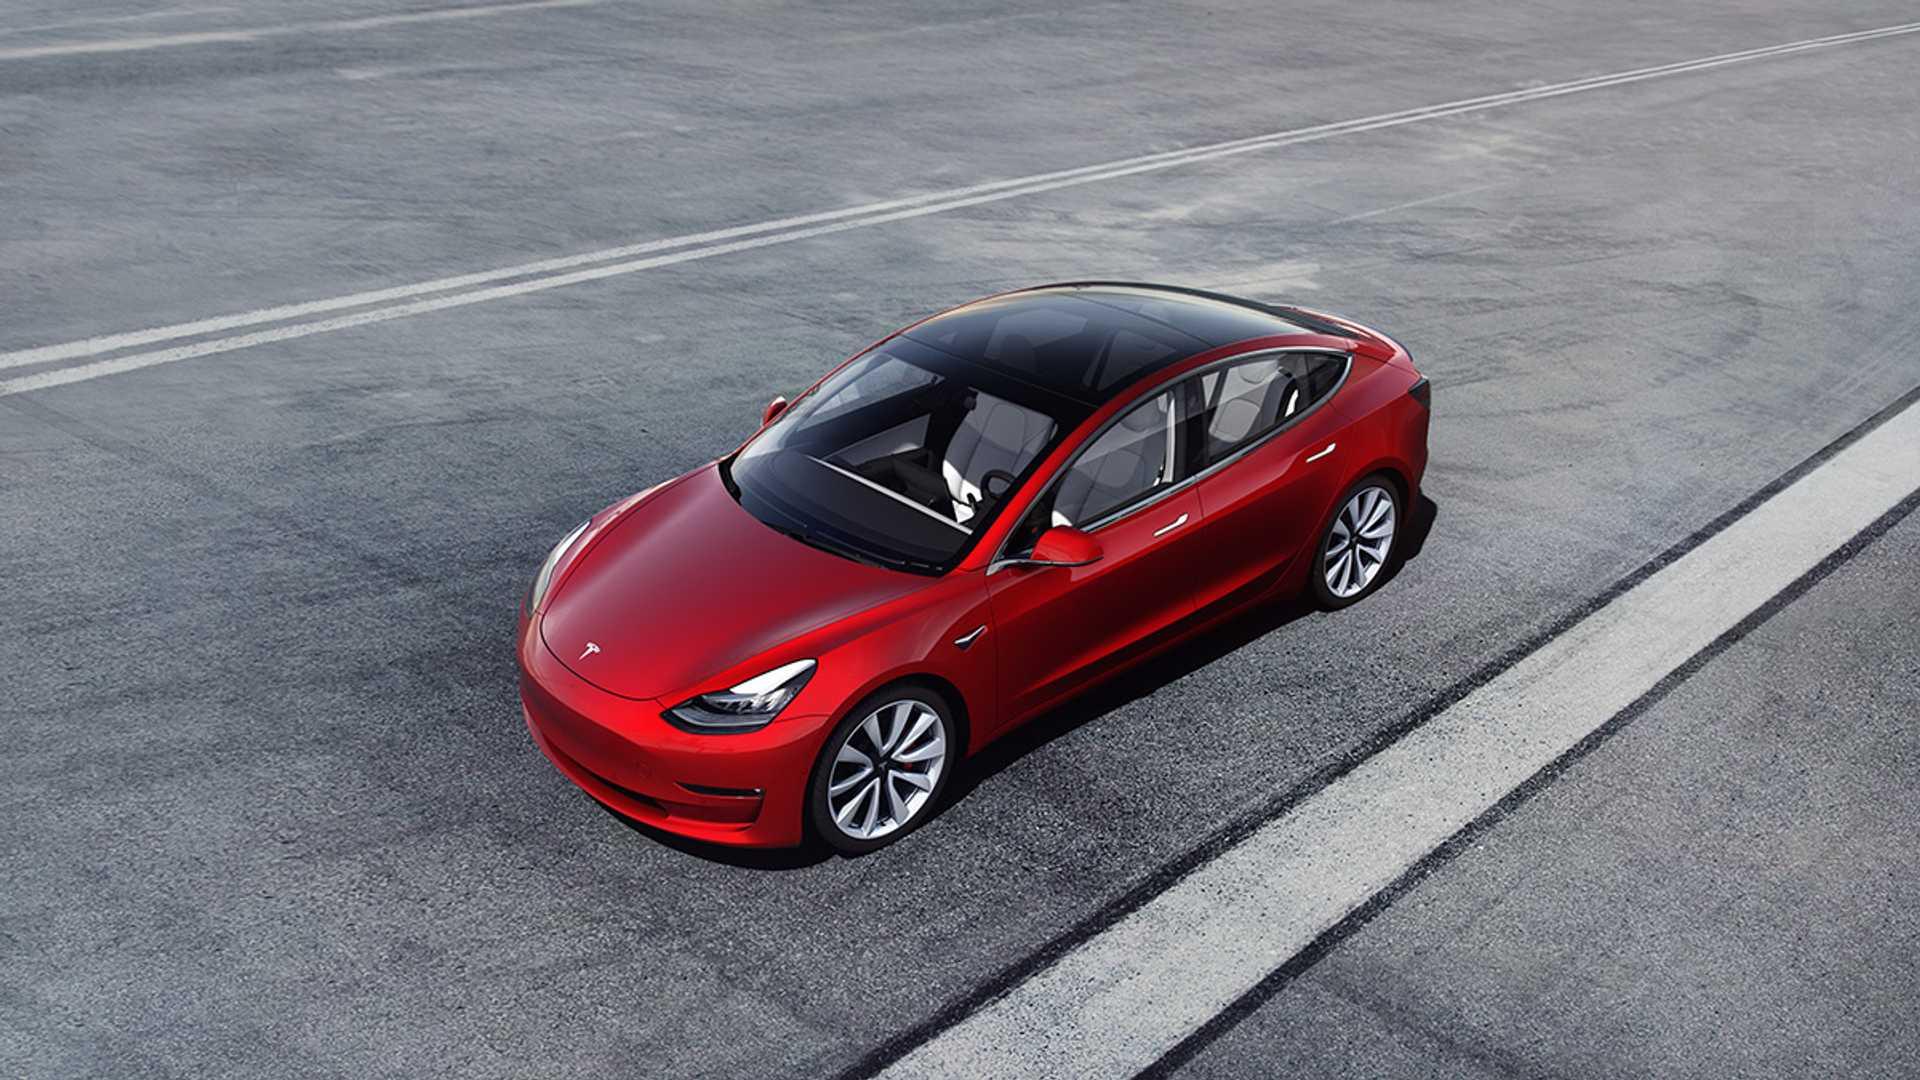 1. Tesla Model 3